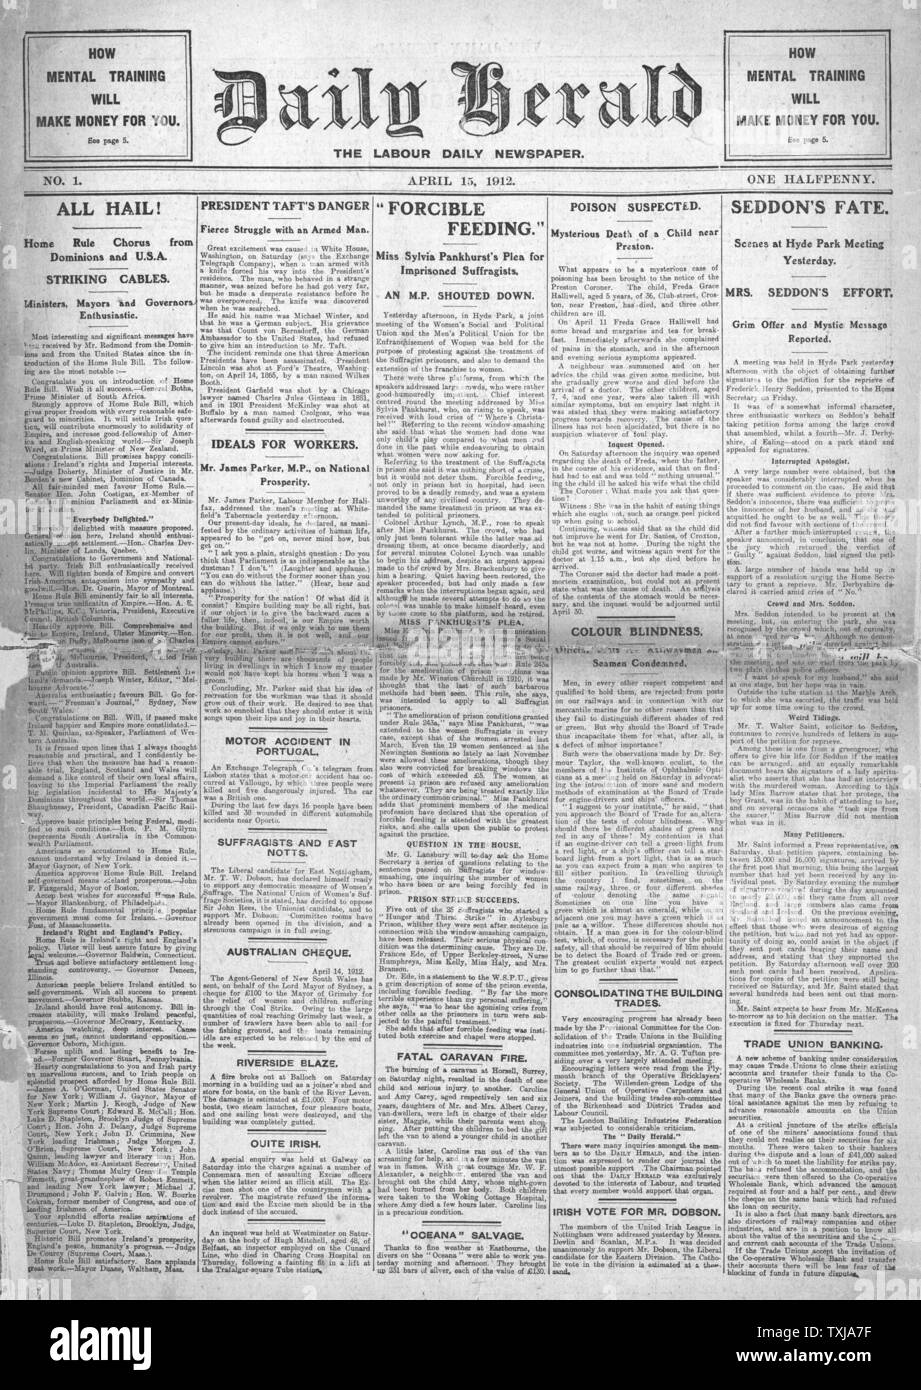 The Herald Newspaper Stock Photos & The Herald Newspaper